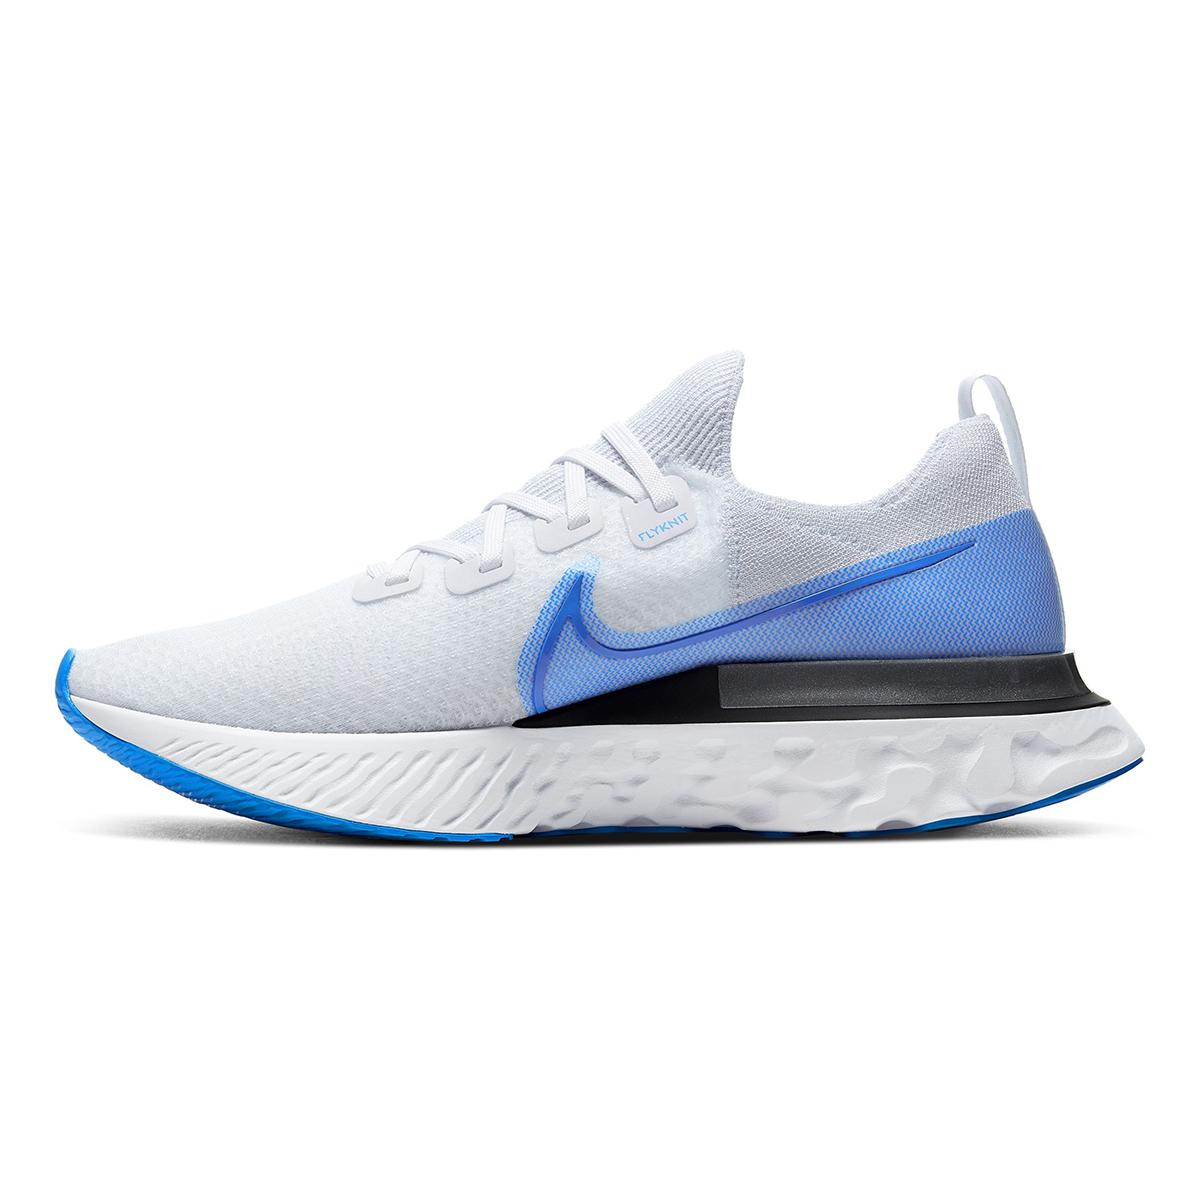 Men's Nike React Infinity Run Flyknit Running Shoe - Color: True White/White/Pure (Regular Width) - Size: 6, True White/White/Pure, large, image 2